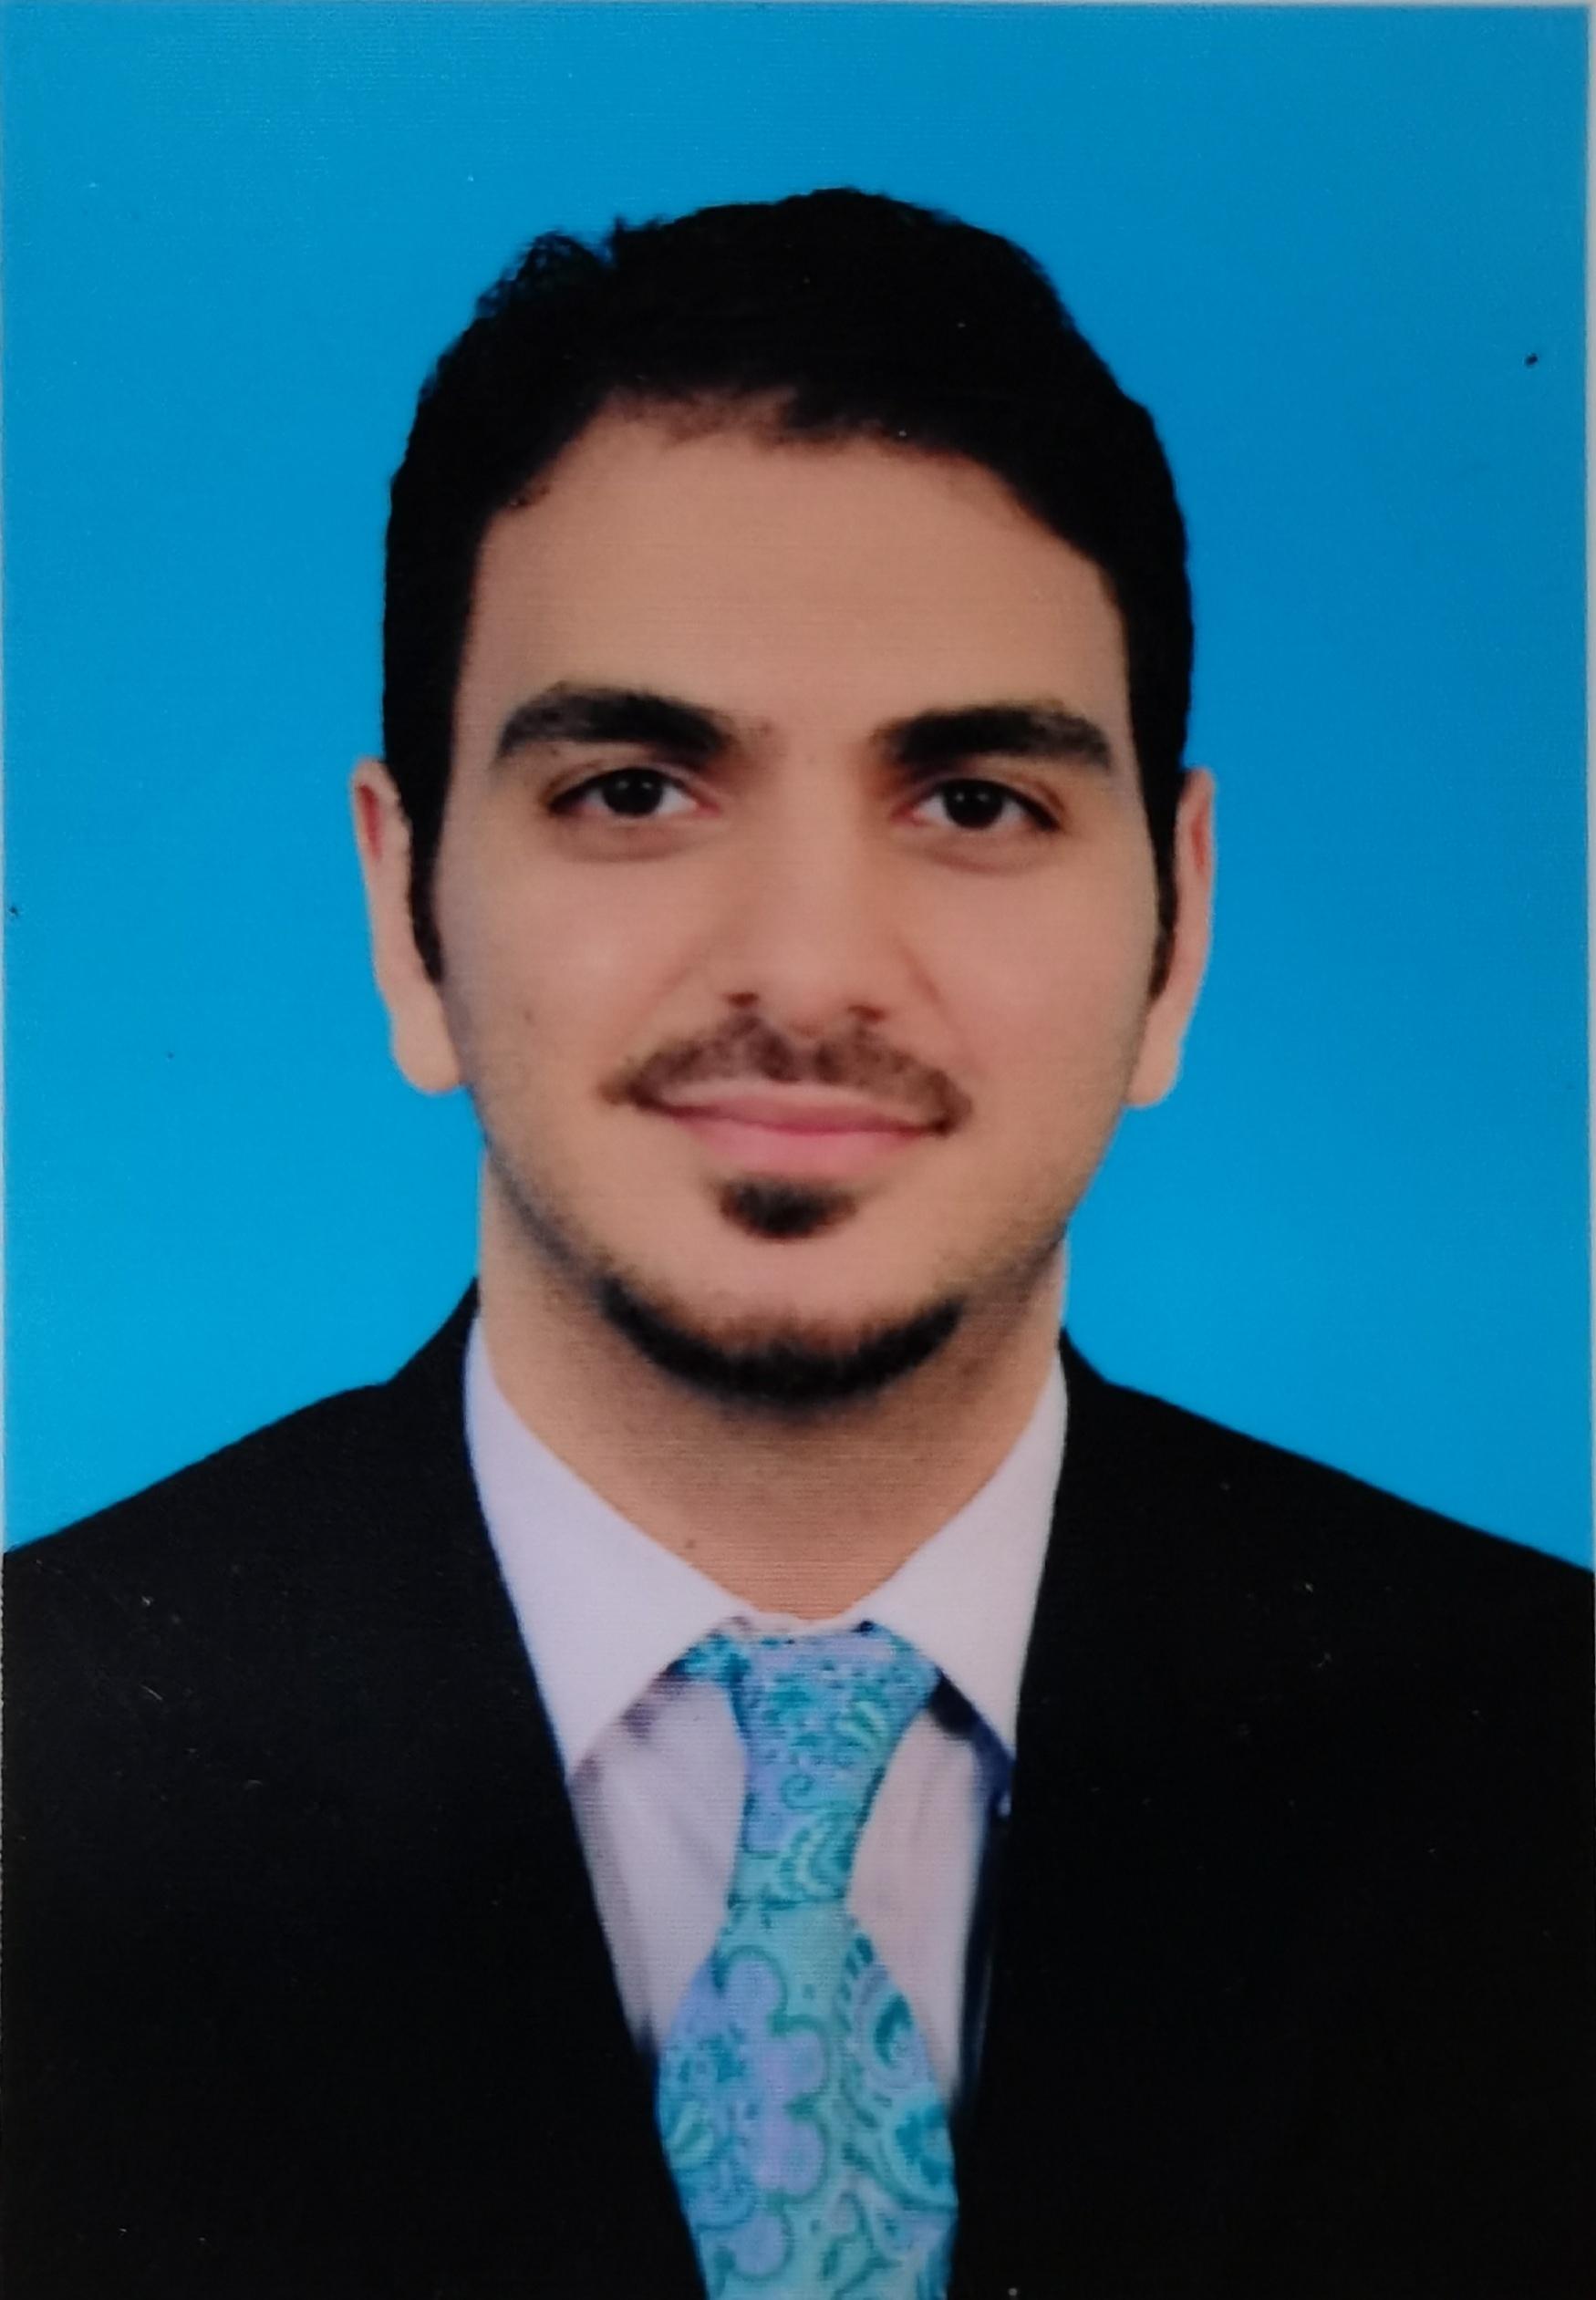 Khalid_almasry Profile Picture